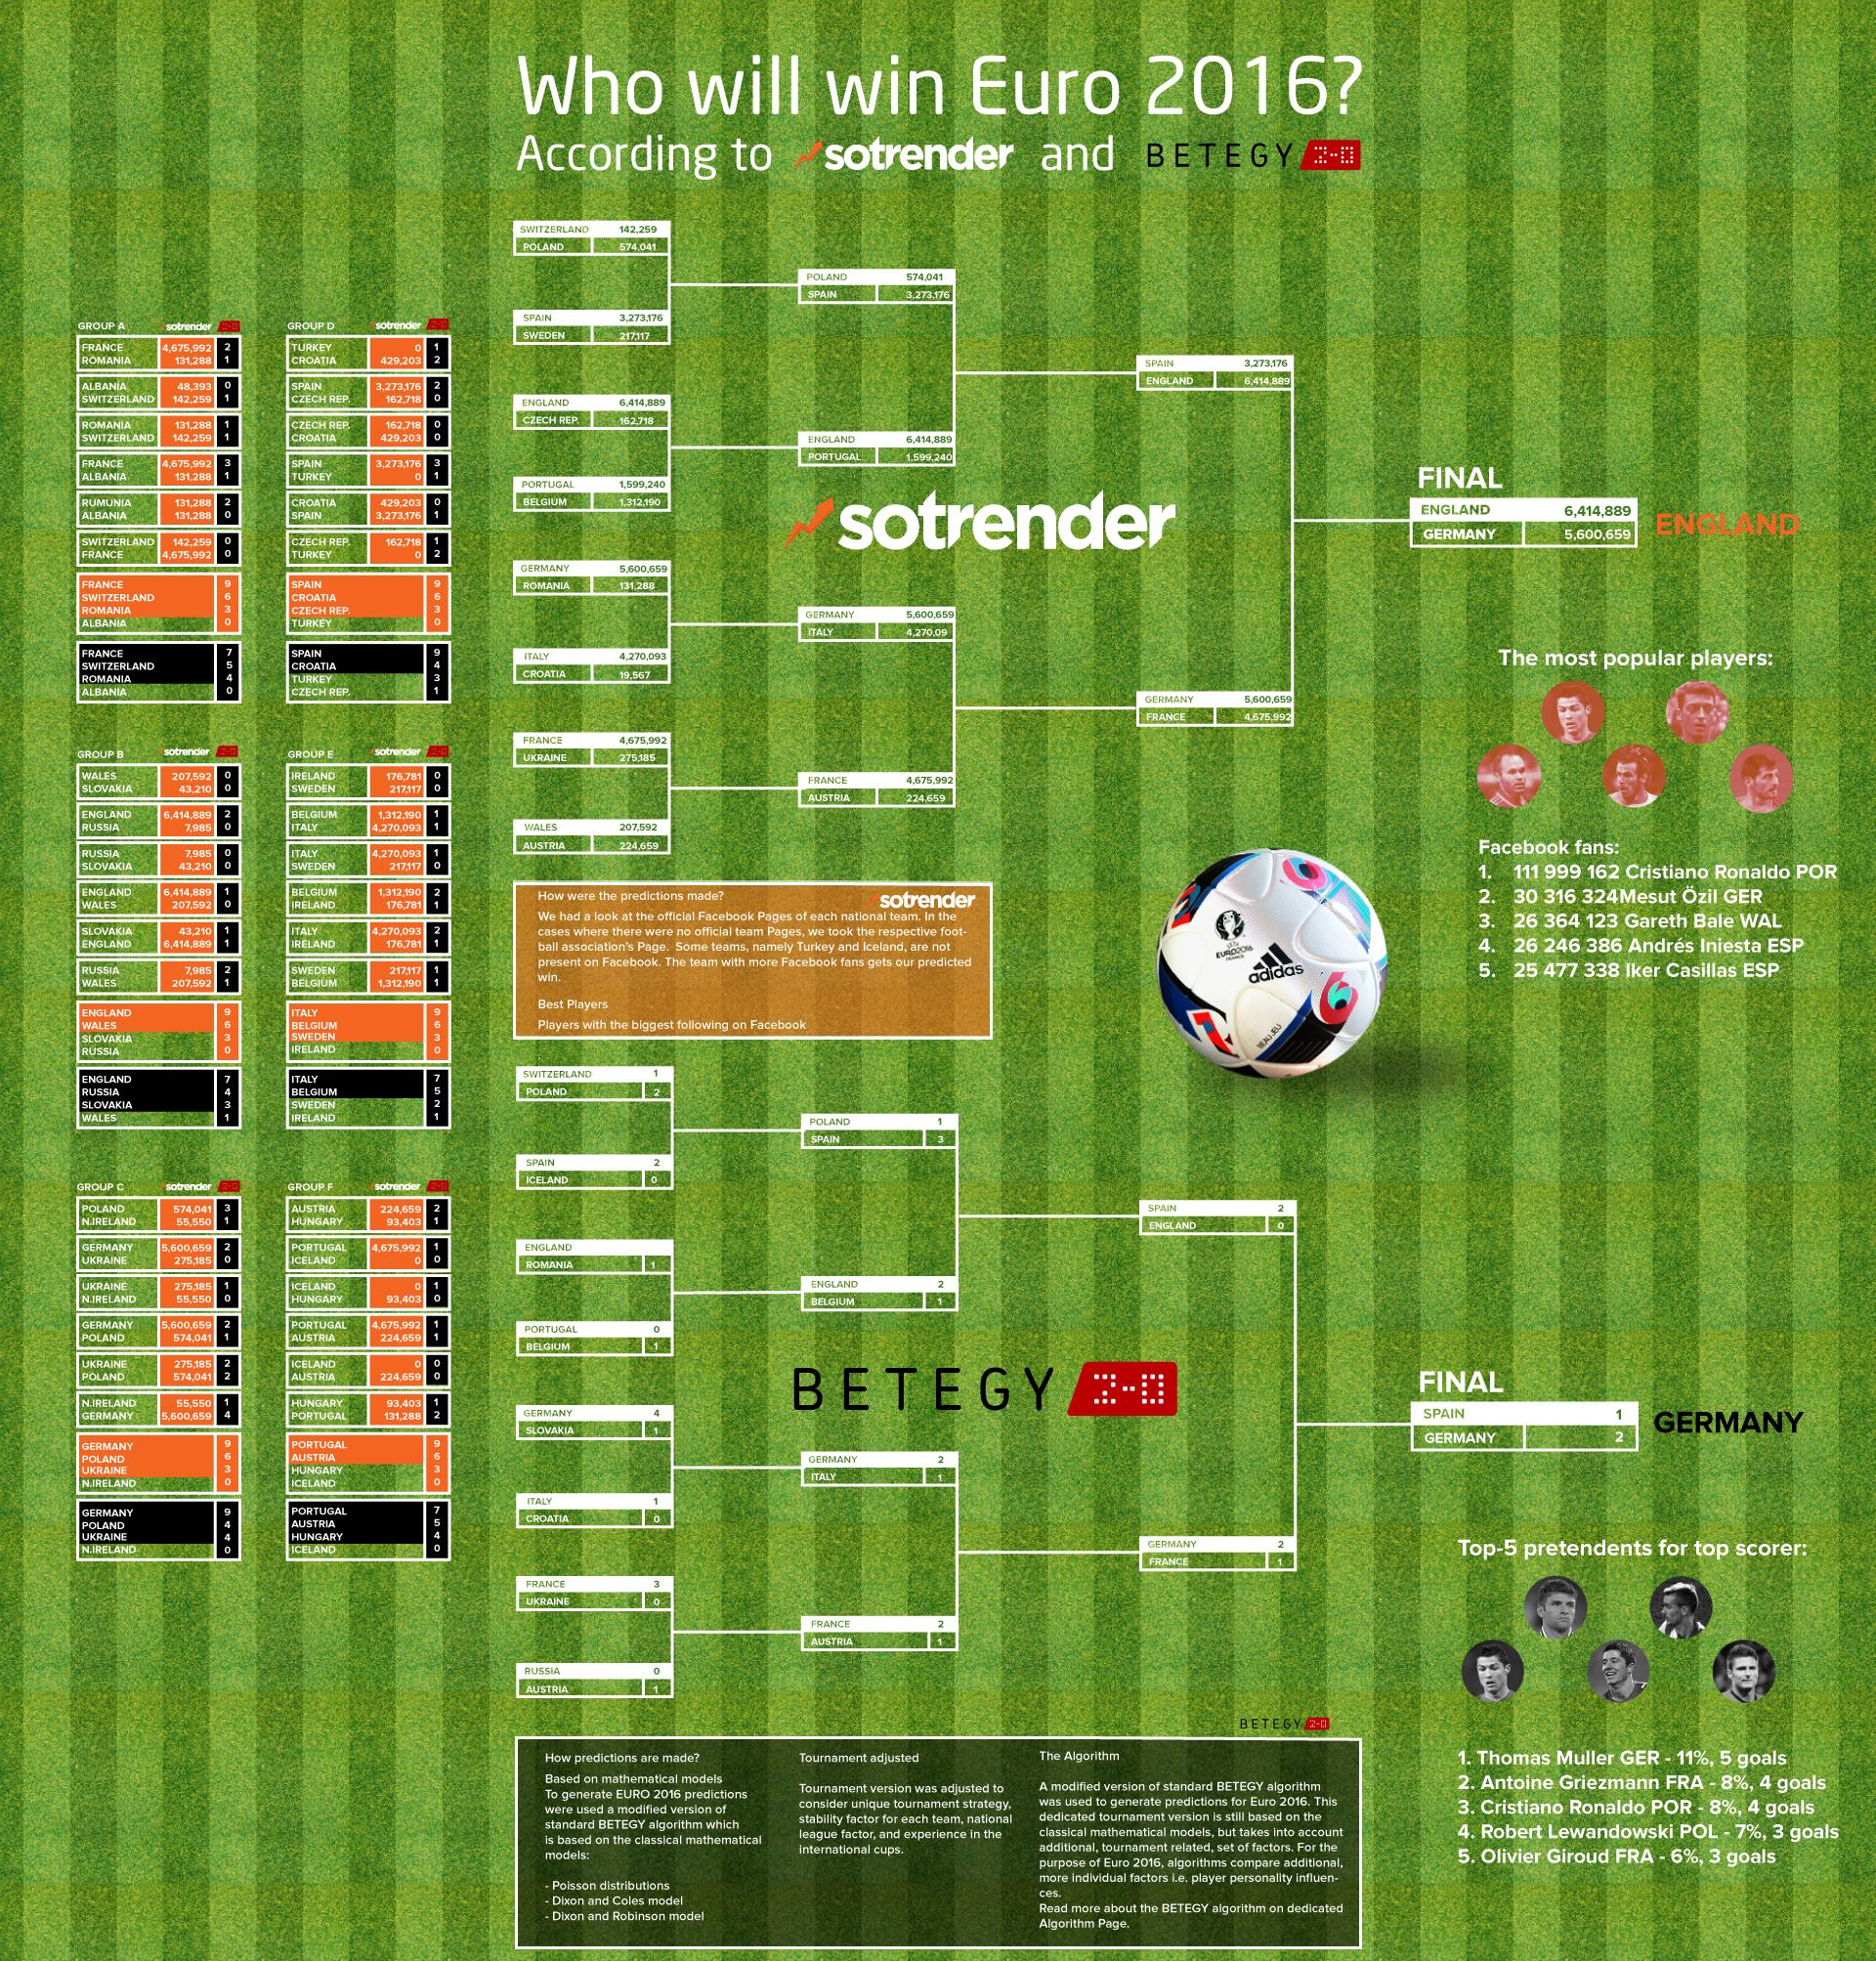 Who will win EURO 2016?